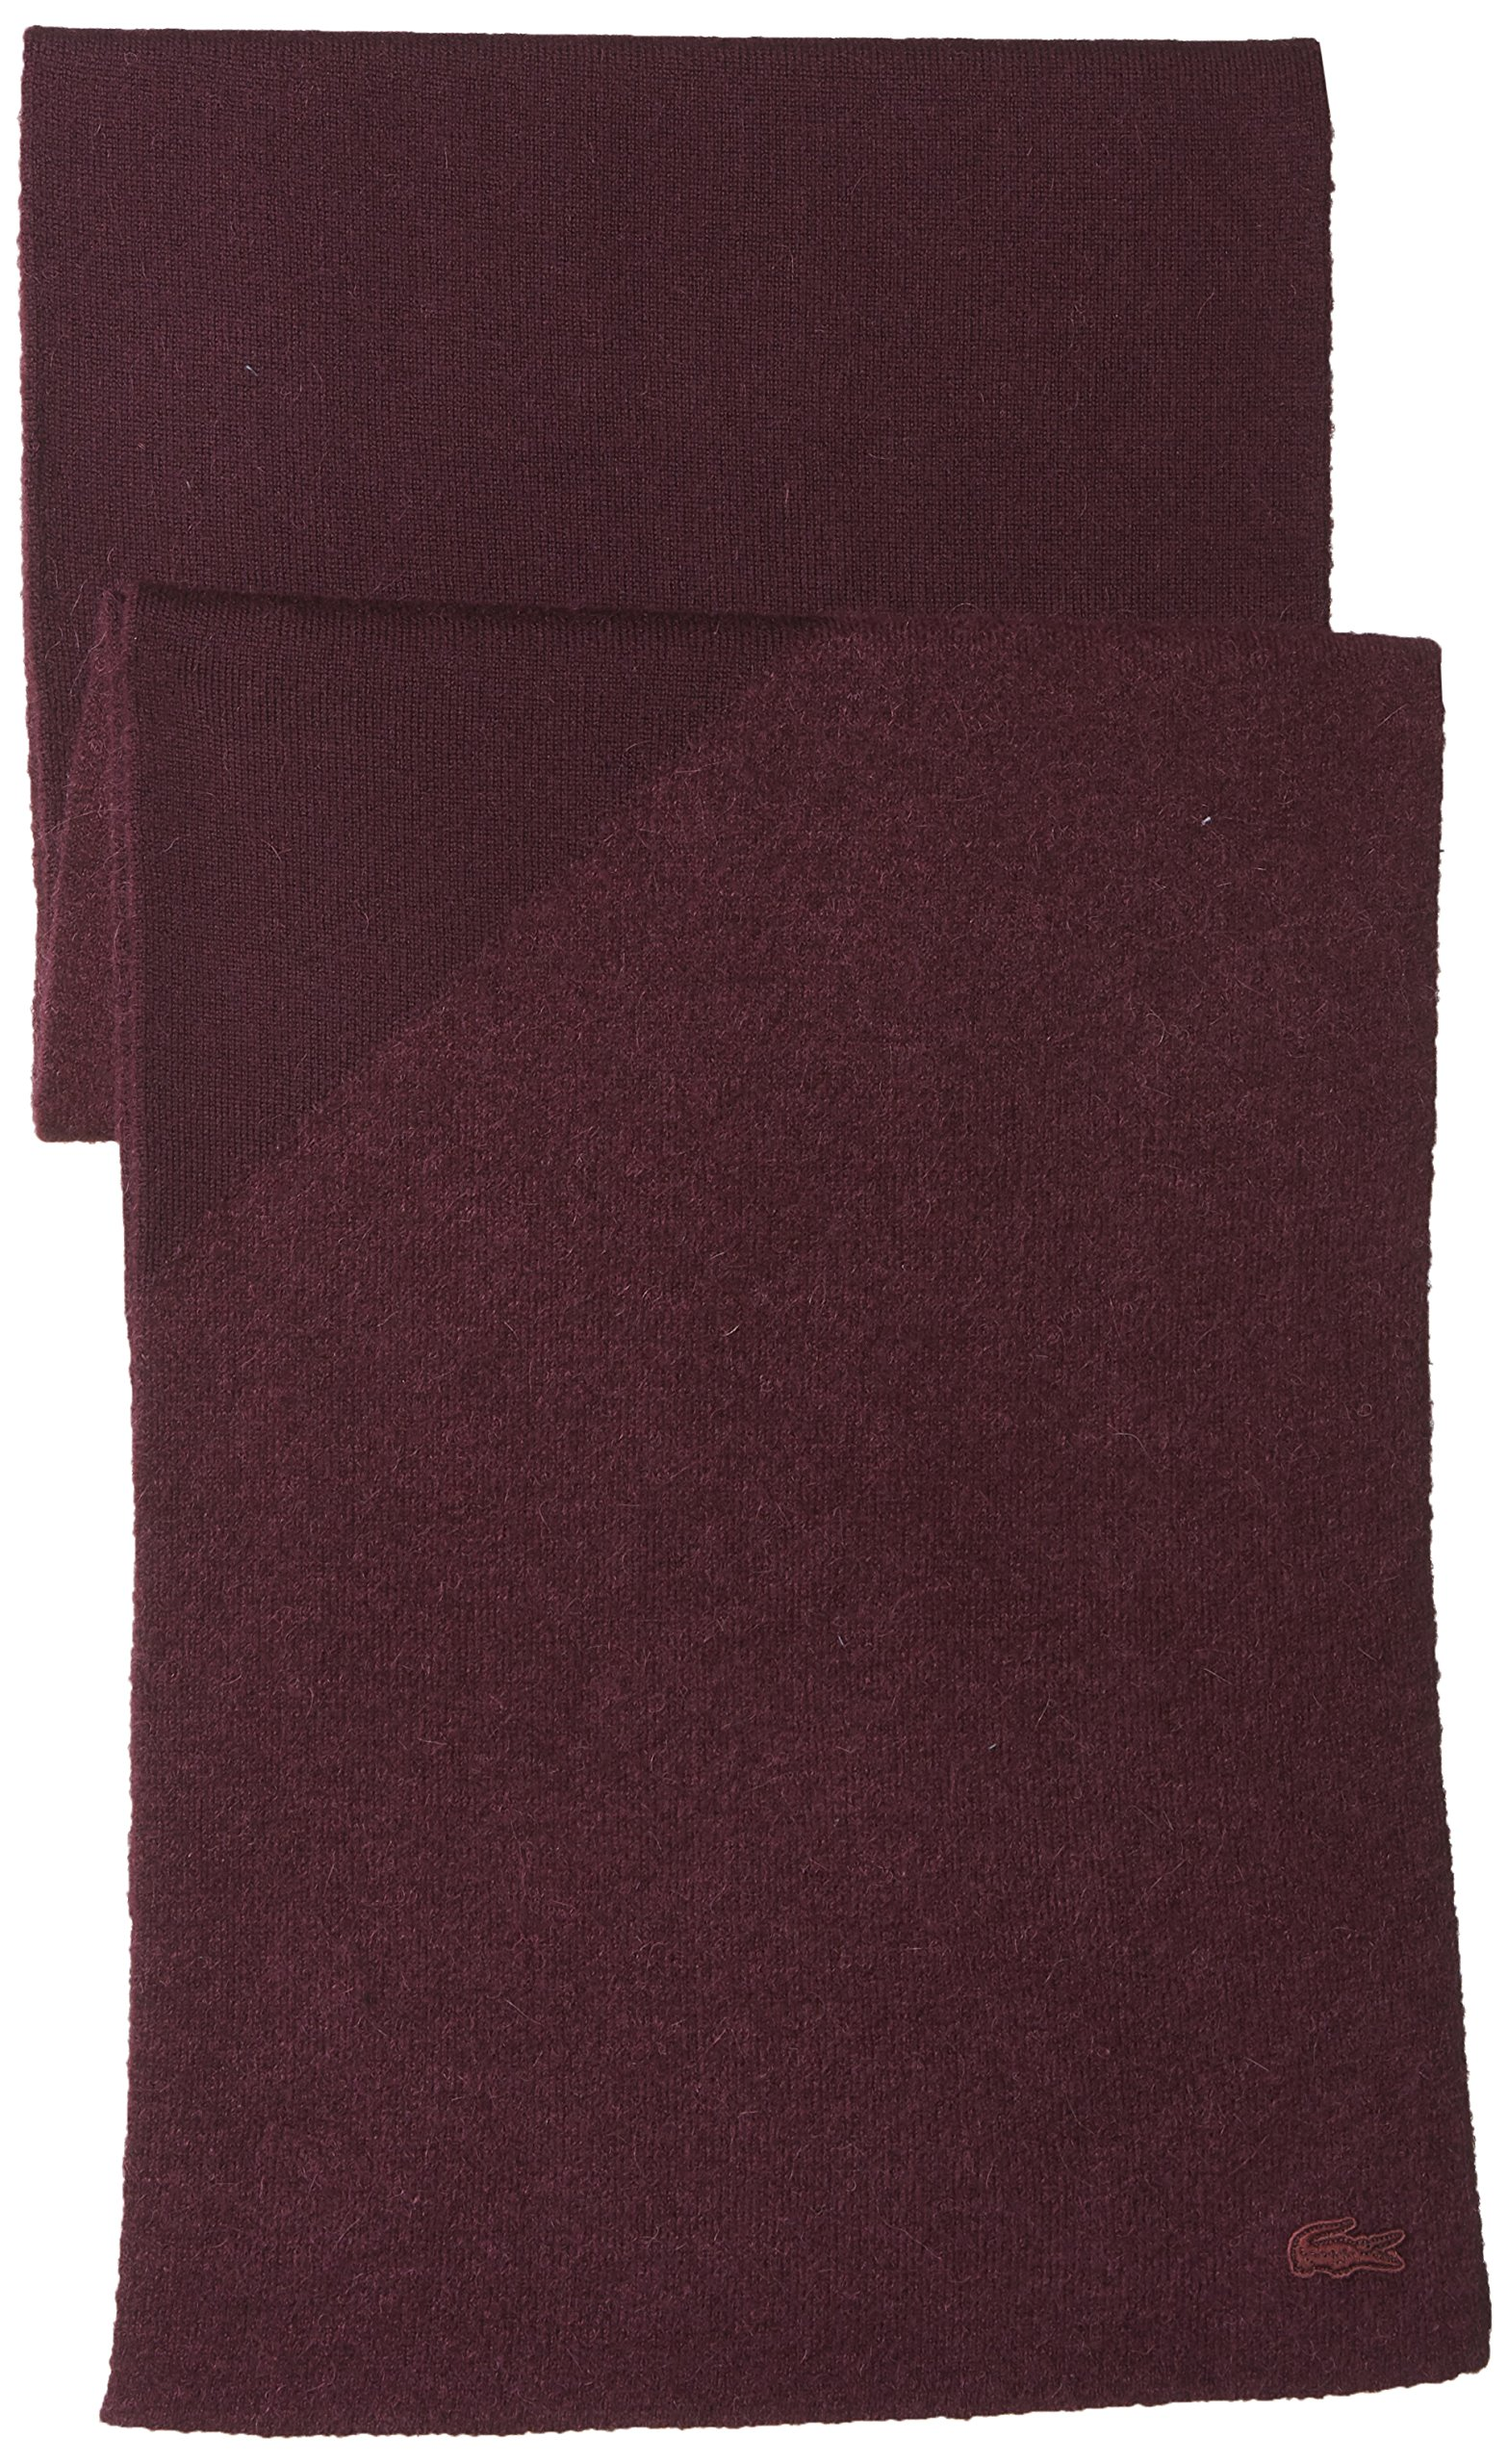 Lacoste Women's Colorblock Scarf, Vendange/Vendange, One Size